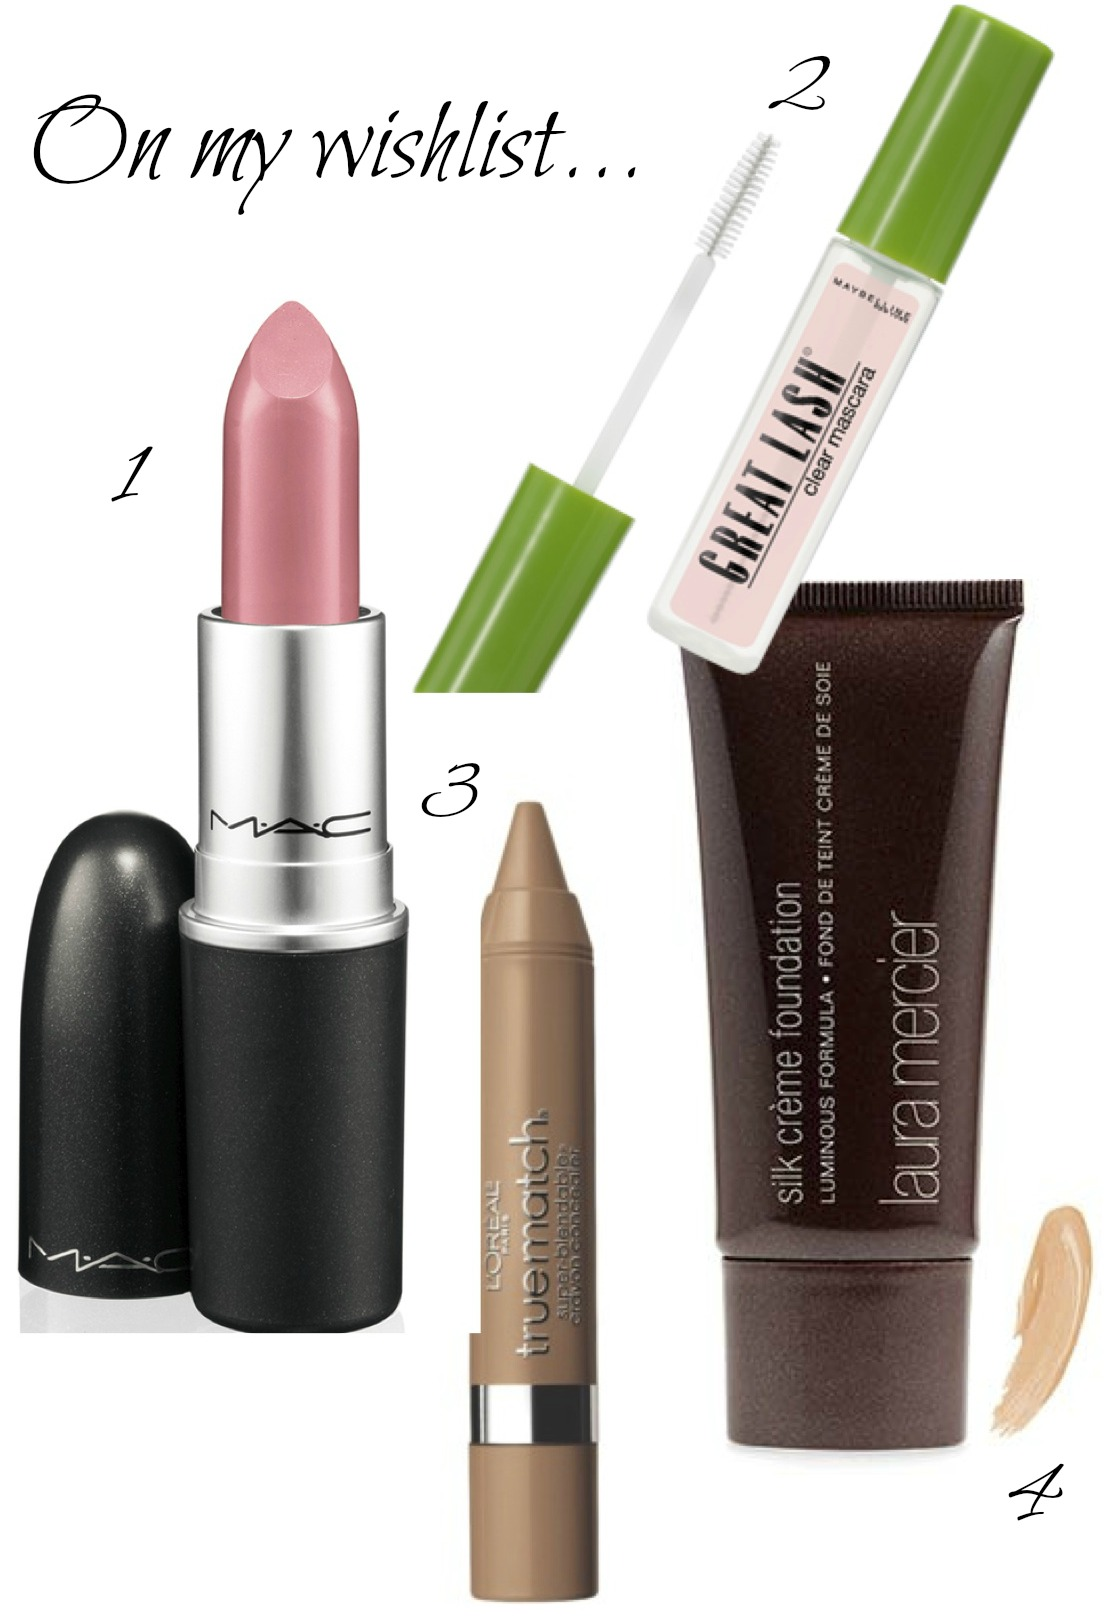 Beauty productspic